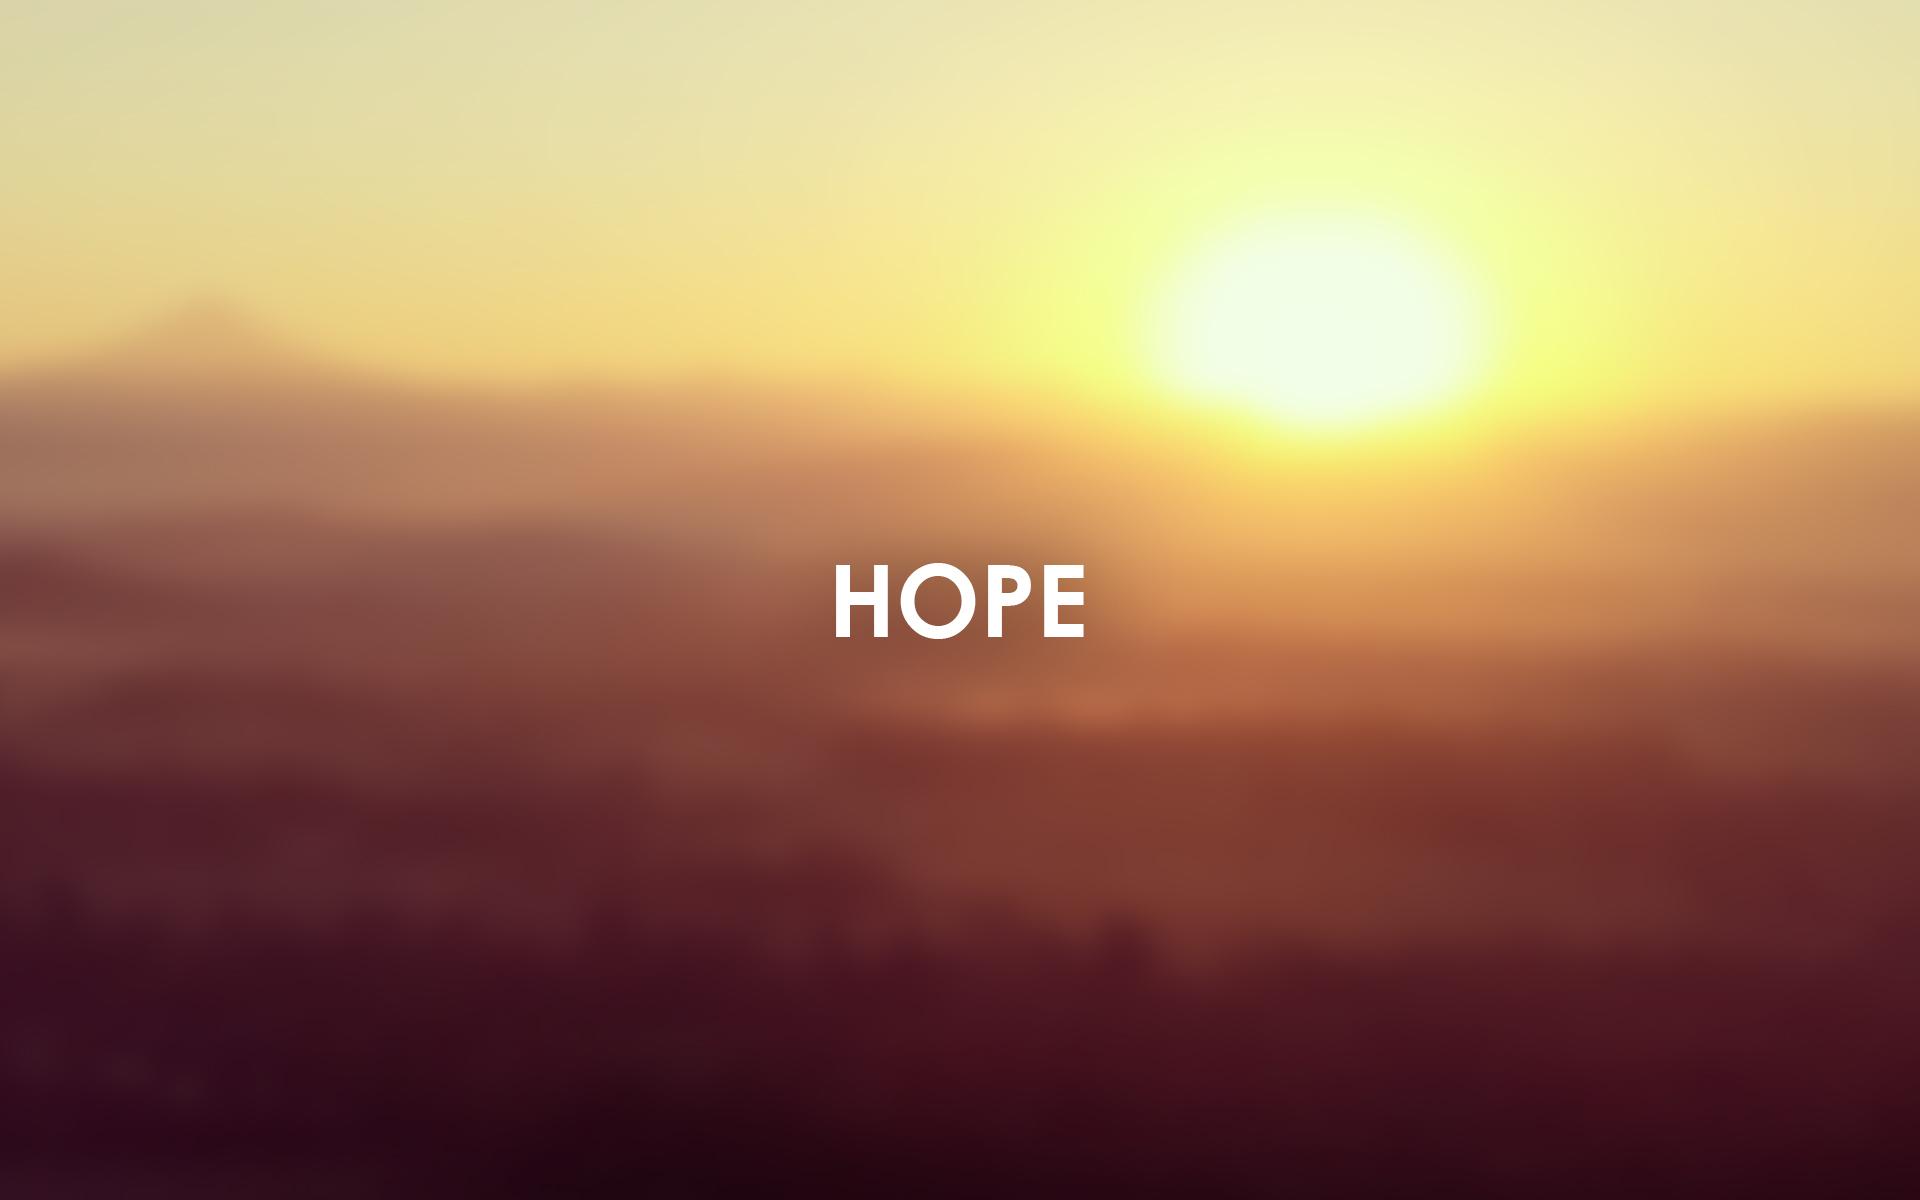 ABC Wallpaper hope